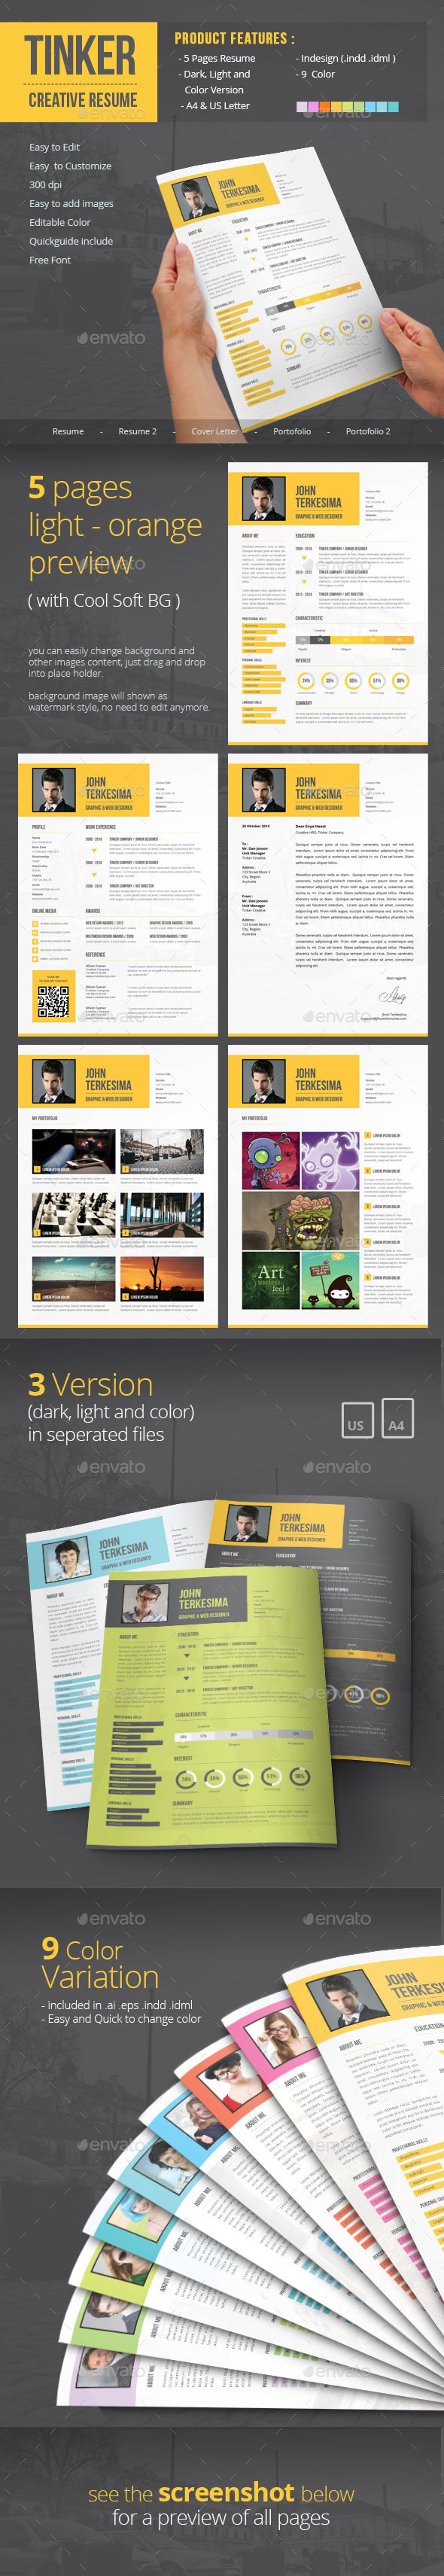 GraphicRiver Tinker Creative Resume 9430554